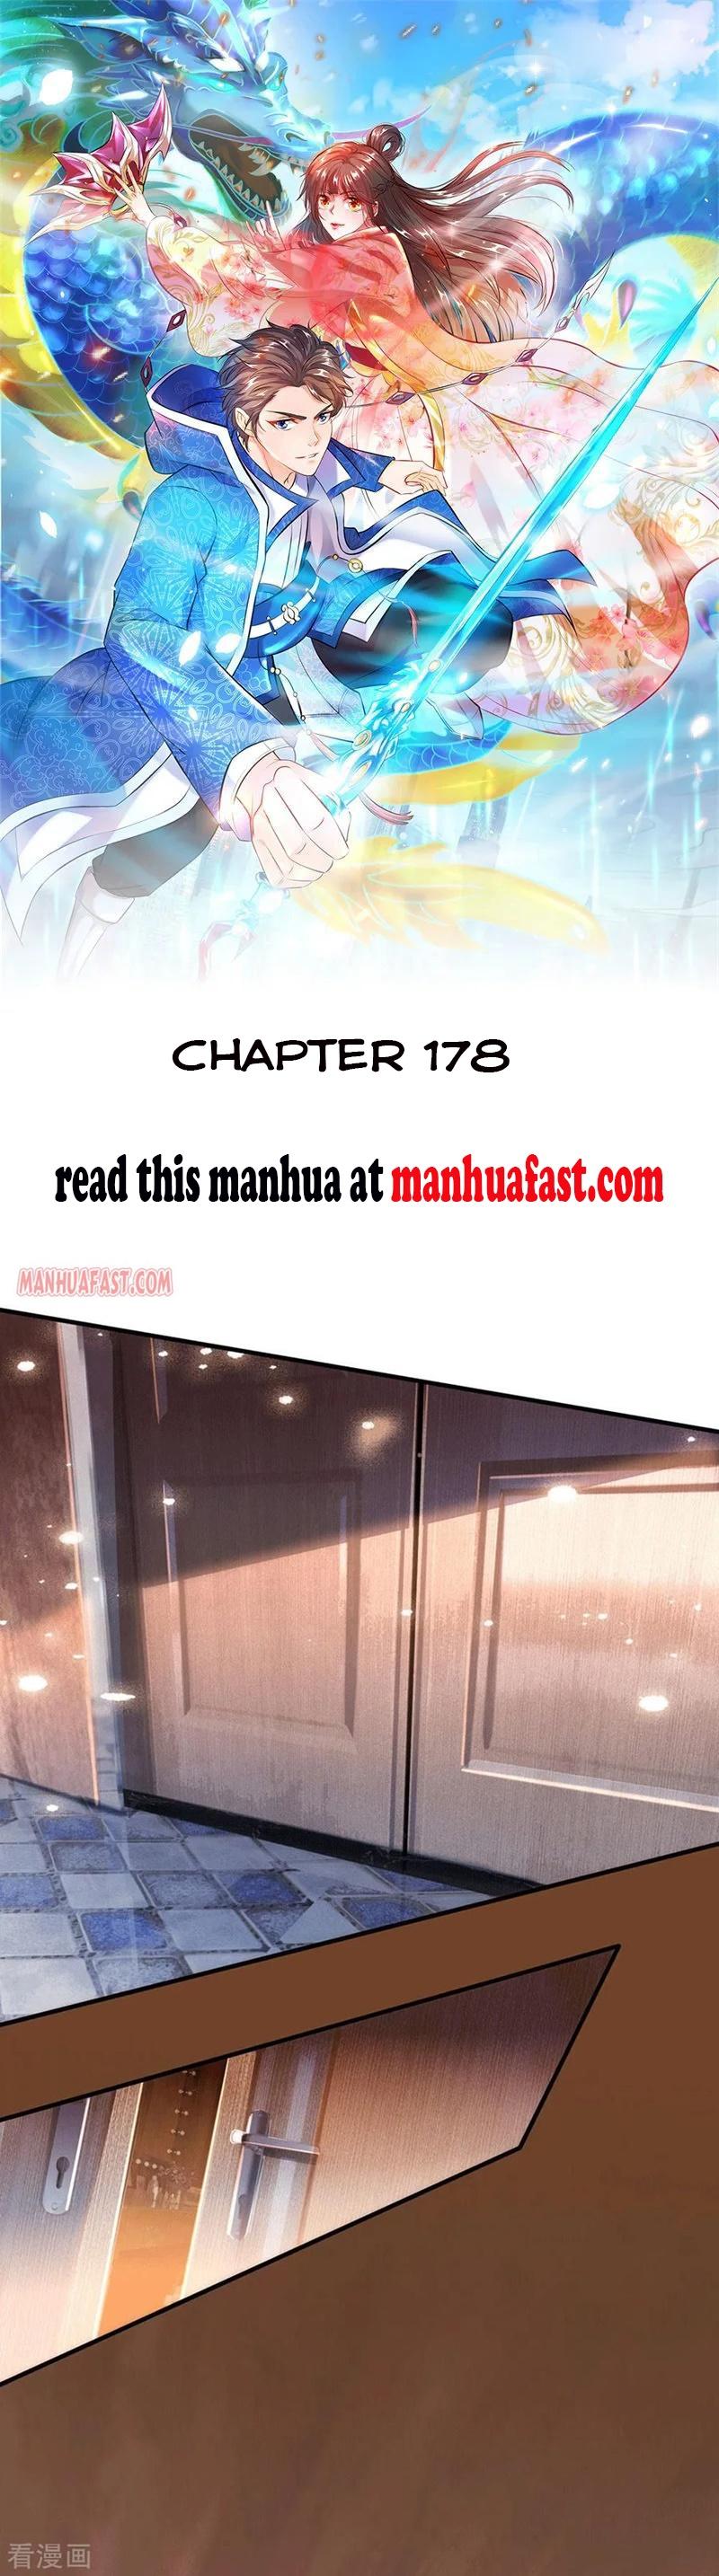 https://manga.mangadogs.com/comics/pic4/39/32615/2841458/11d76a70993128207c4e21f6a7a83d6d.jpg Page 1